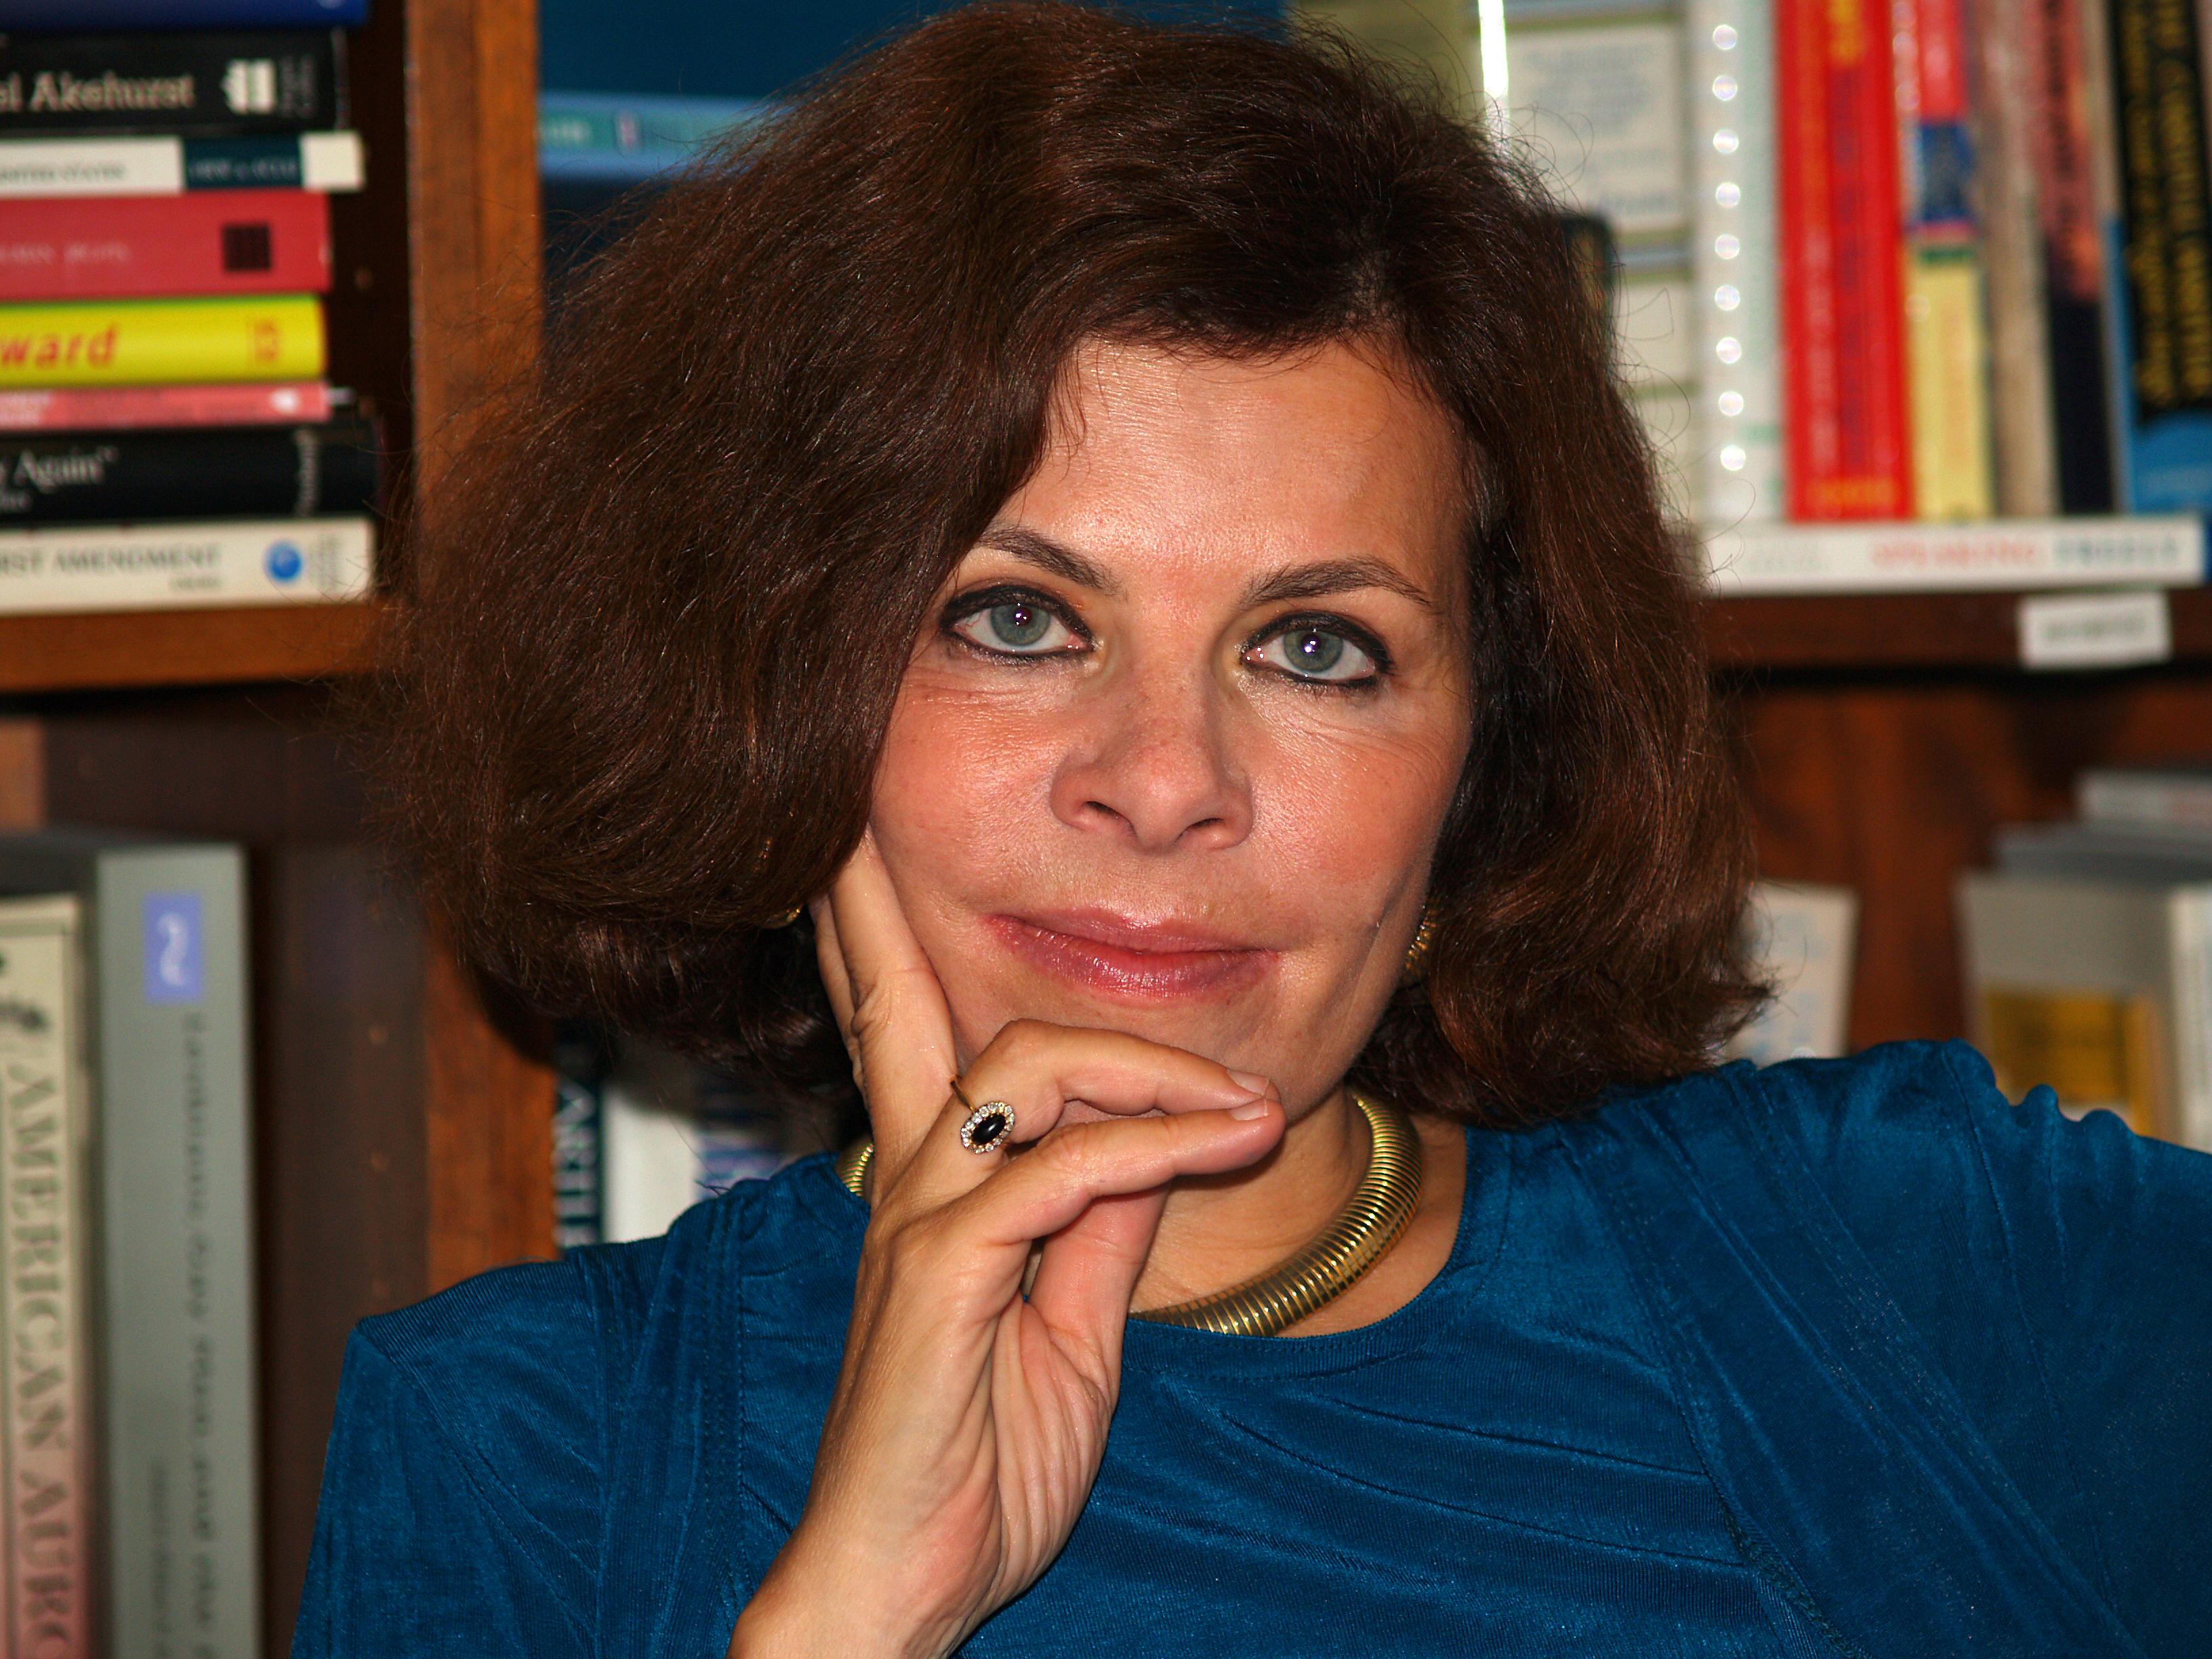 File:Nadine Strossen by David Shankbone.jpg - Wikimedia Commons